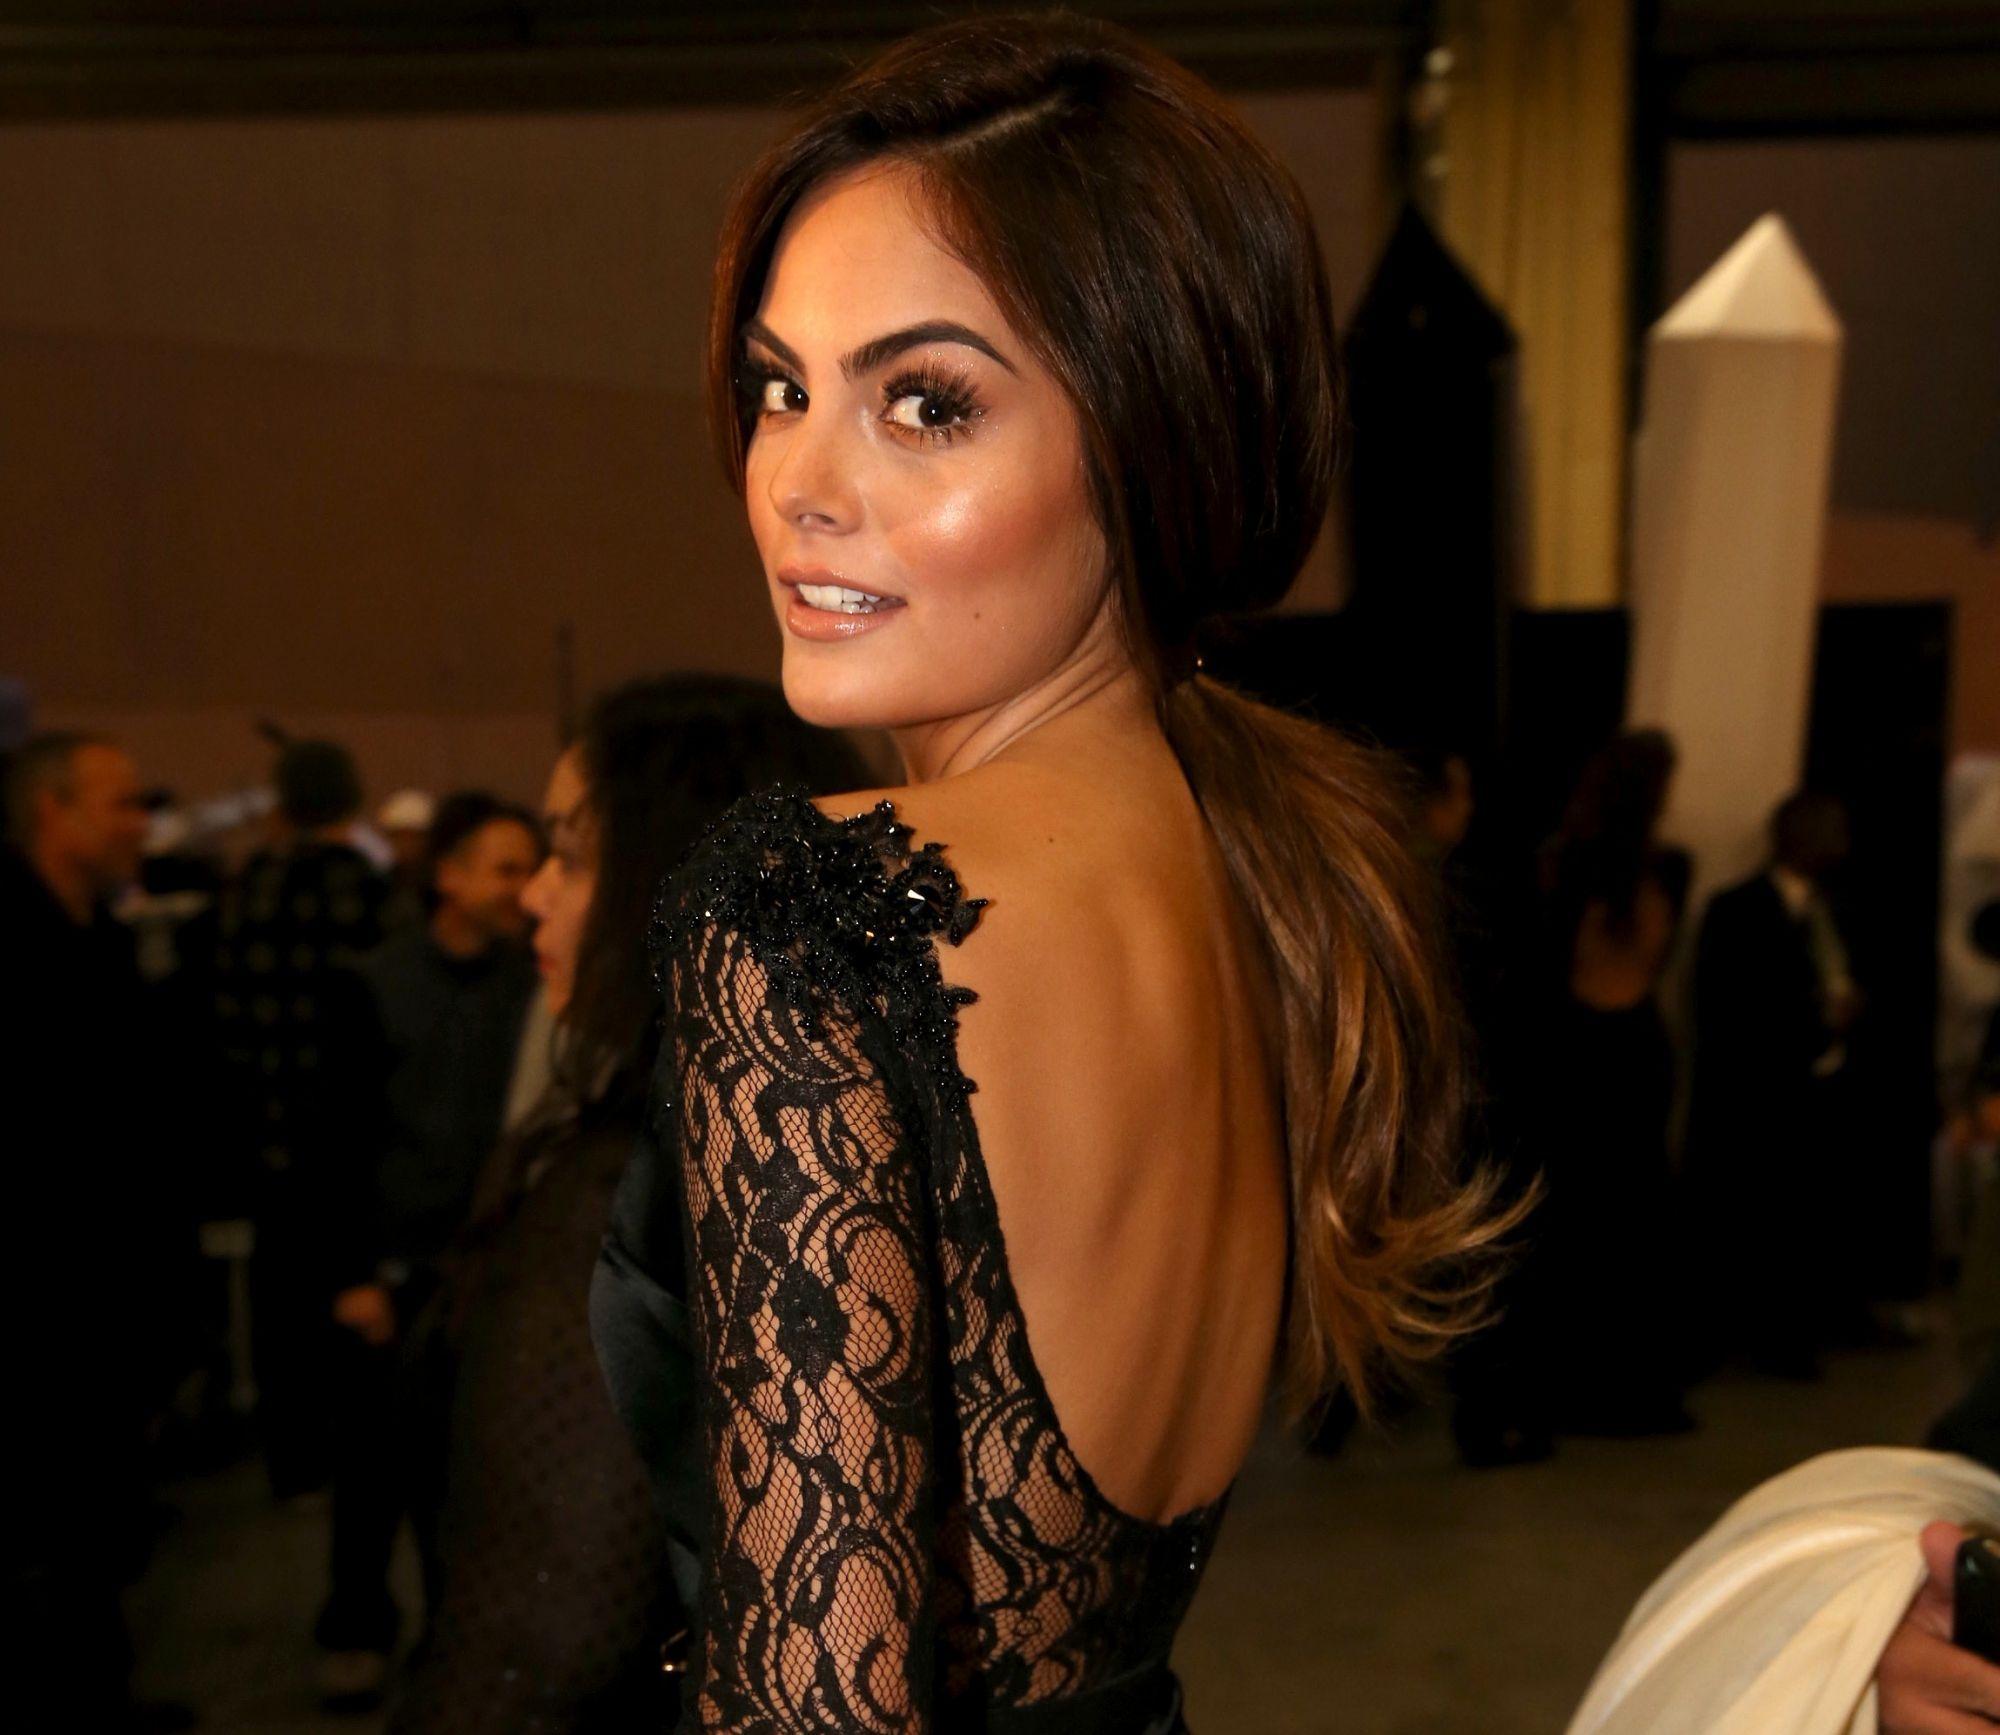 Ximena Navarrete, ¿desnuda? | Celebrity News | Ximena ...  Ximena Navarret...